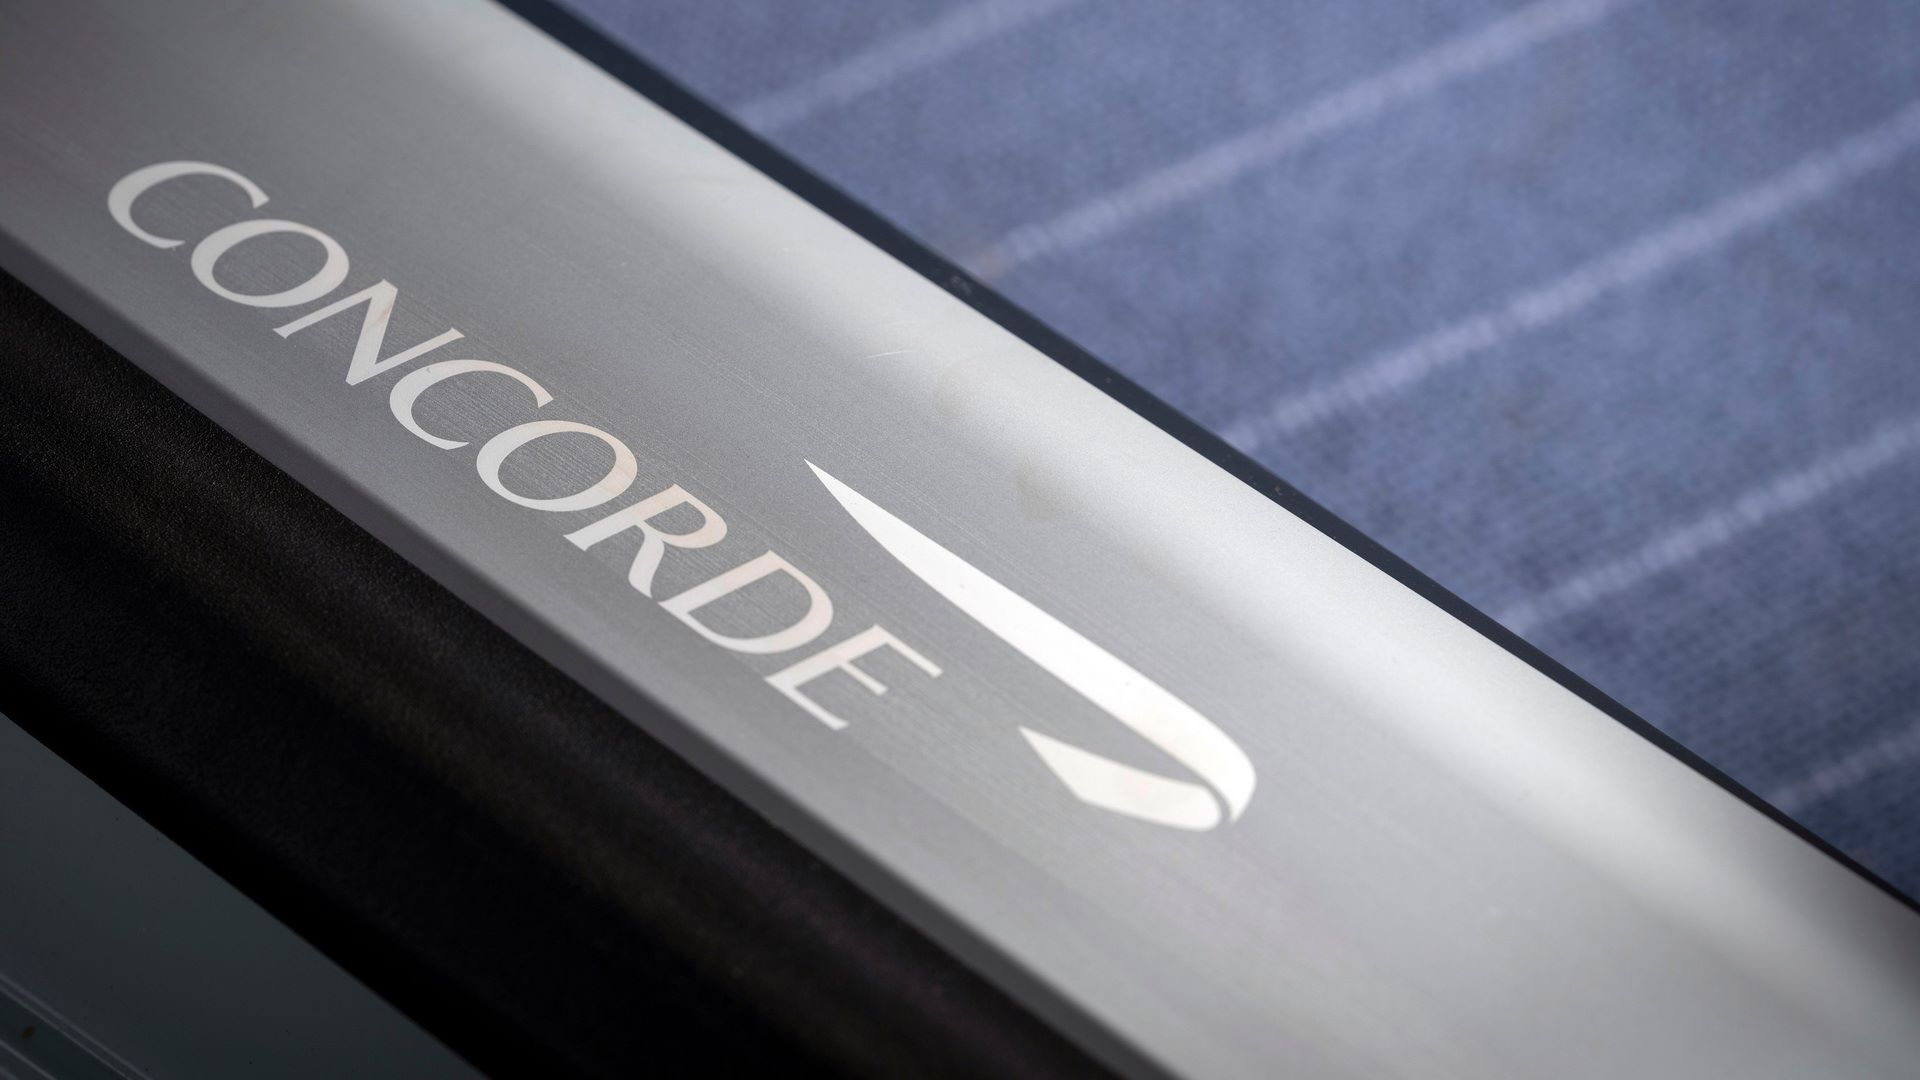 2021-aston-martin-dbs-superleggera-concorde-edition-4